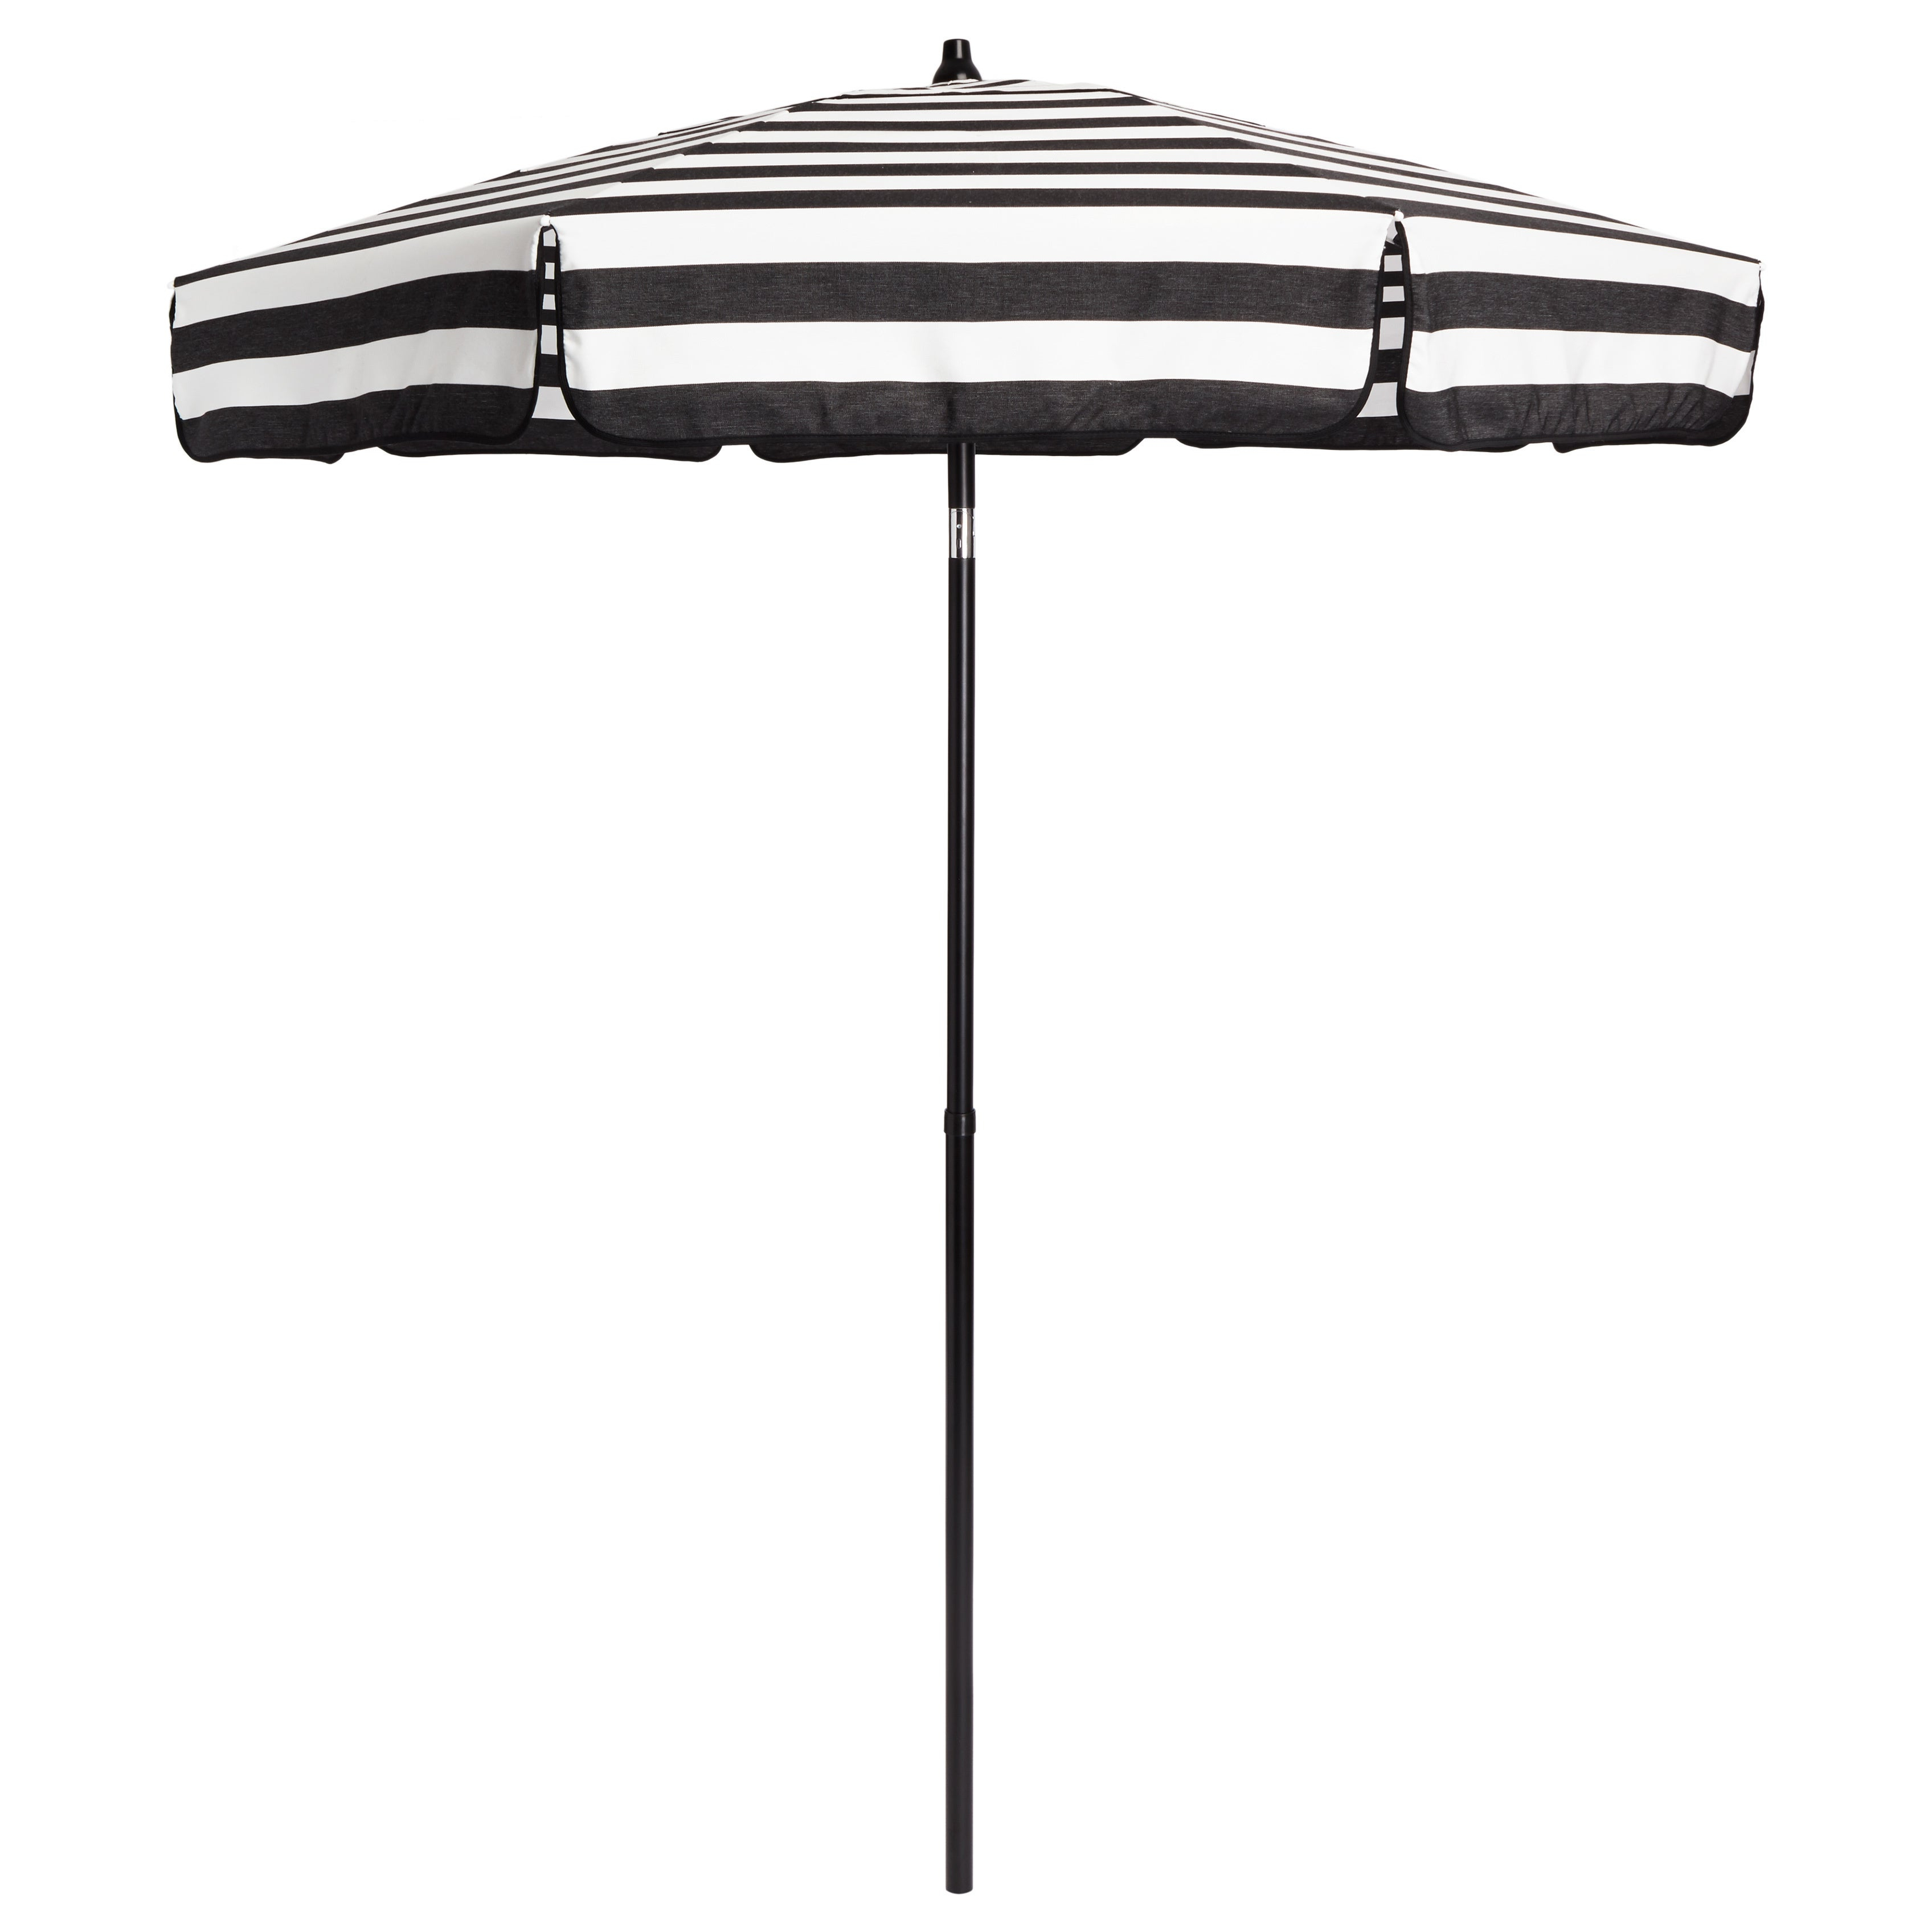 Italian Bistro 6 Foot Acrylic Striped Patio Umbrella Regarding Well Liked Italian Drape Umbrellas (View 14 of 20)